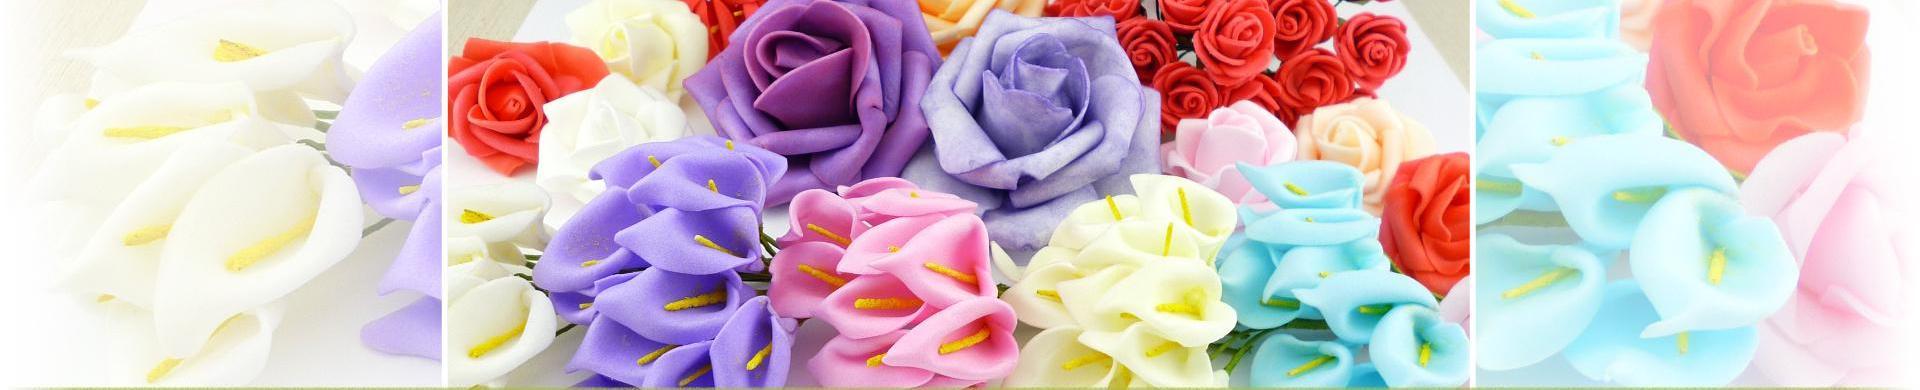 Foam Roses